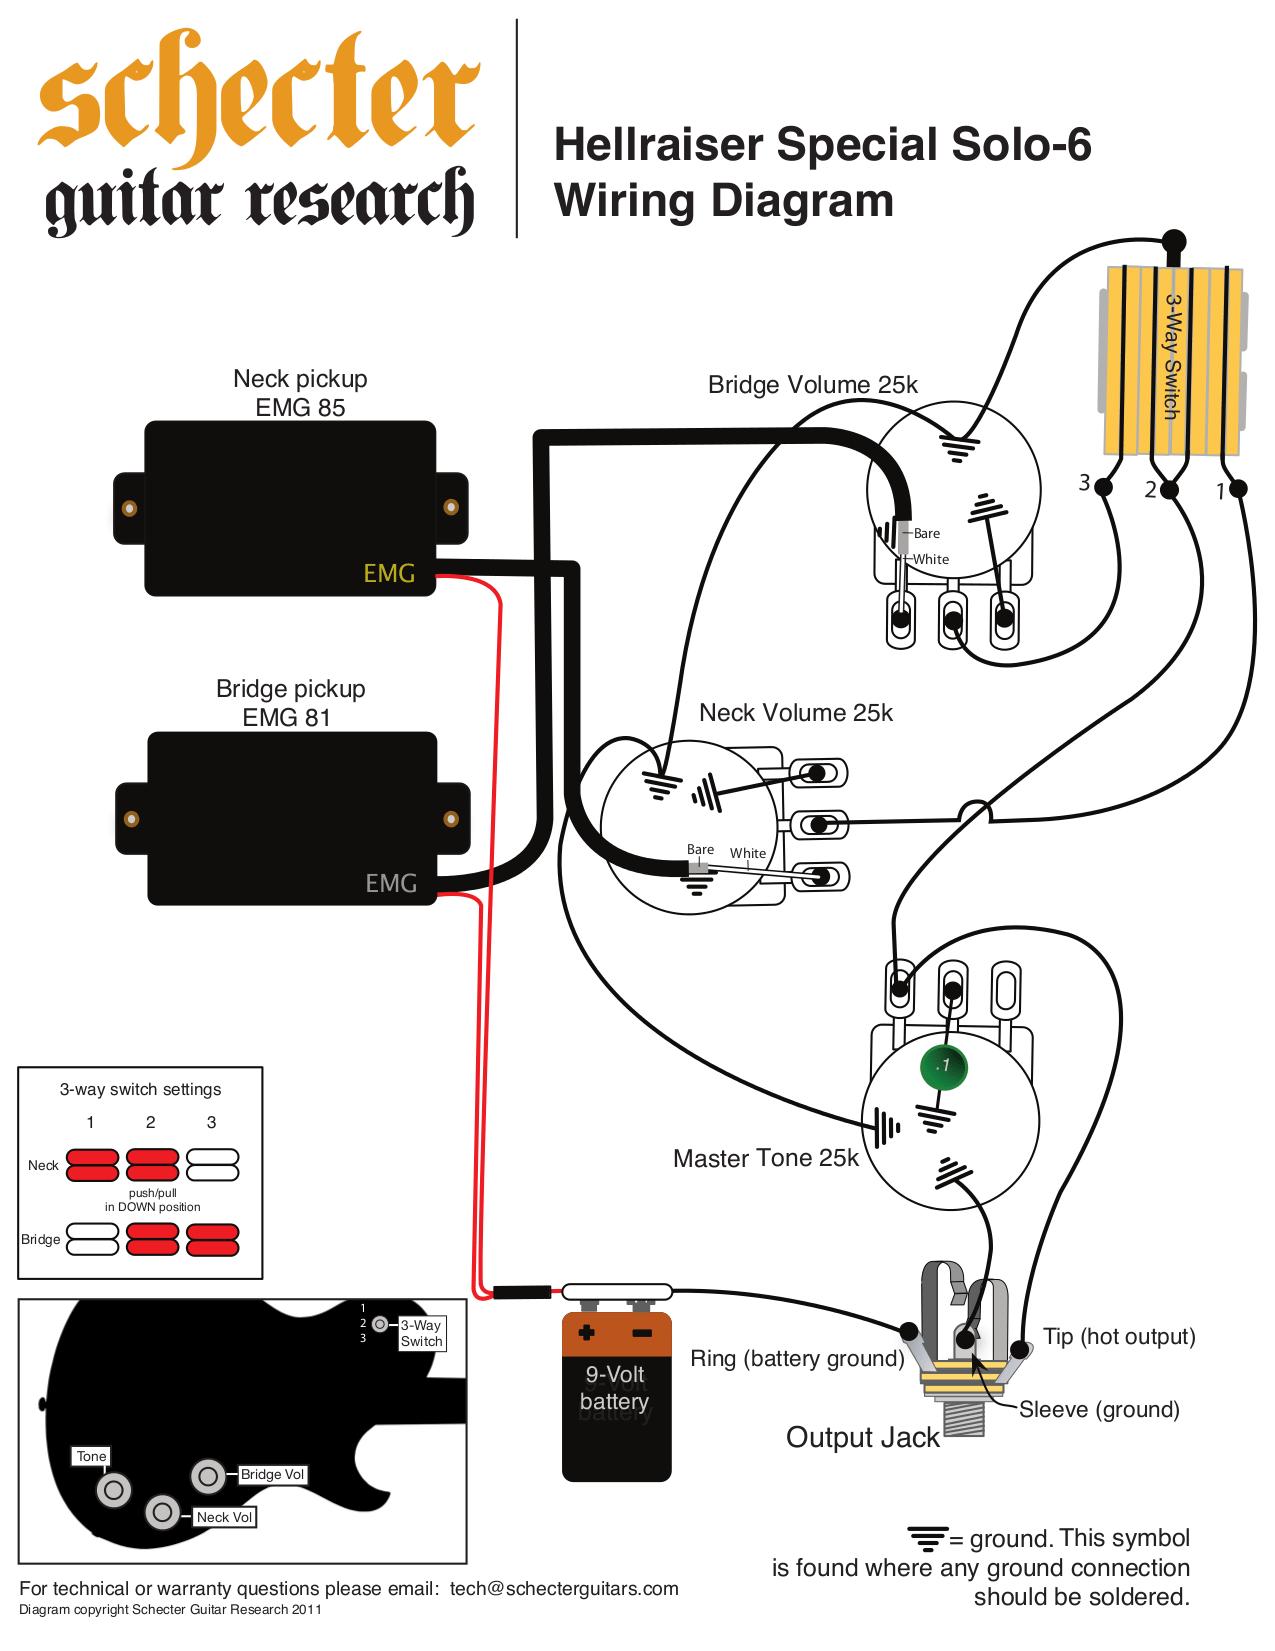 H2a Emg Pickup Wiring Diagrams | Wiring Resources 2019 H A Emg Pickup Wiring Diagram on